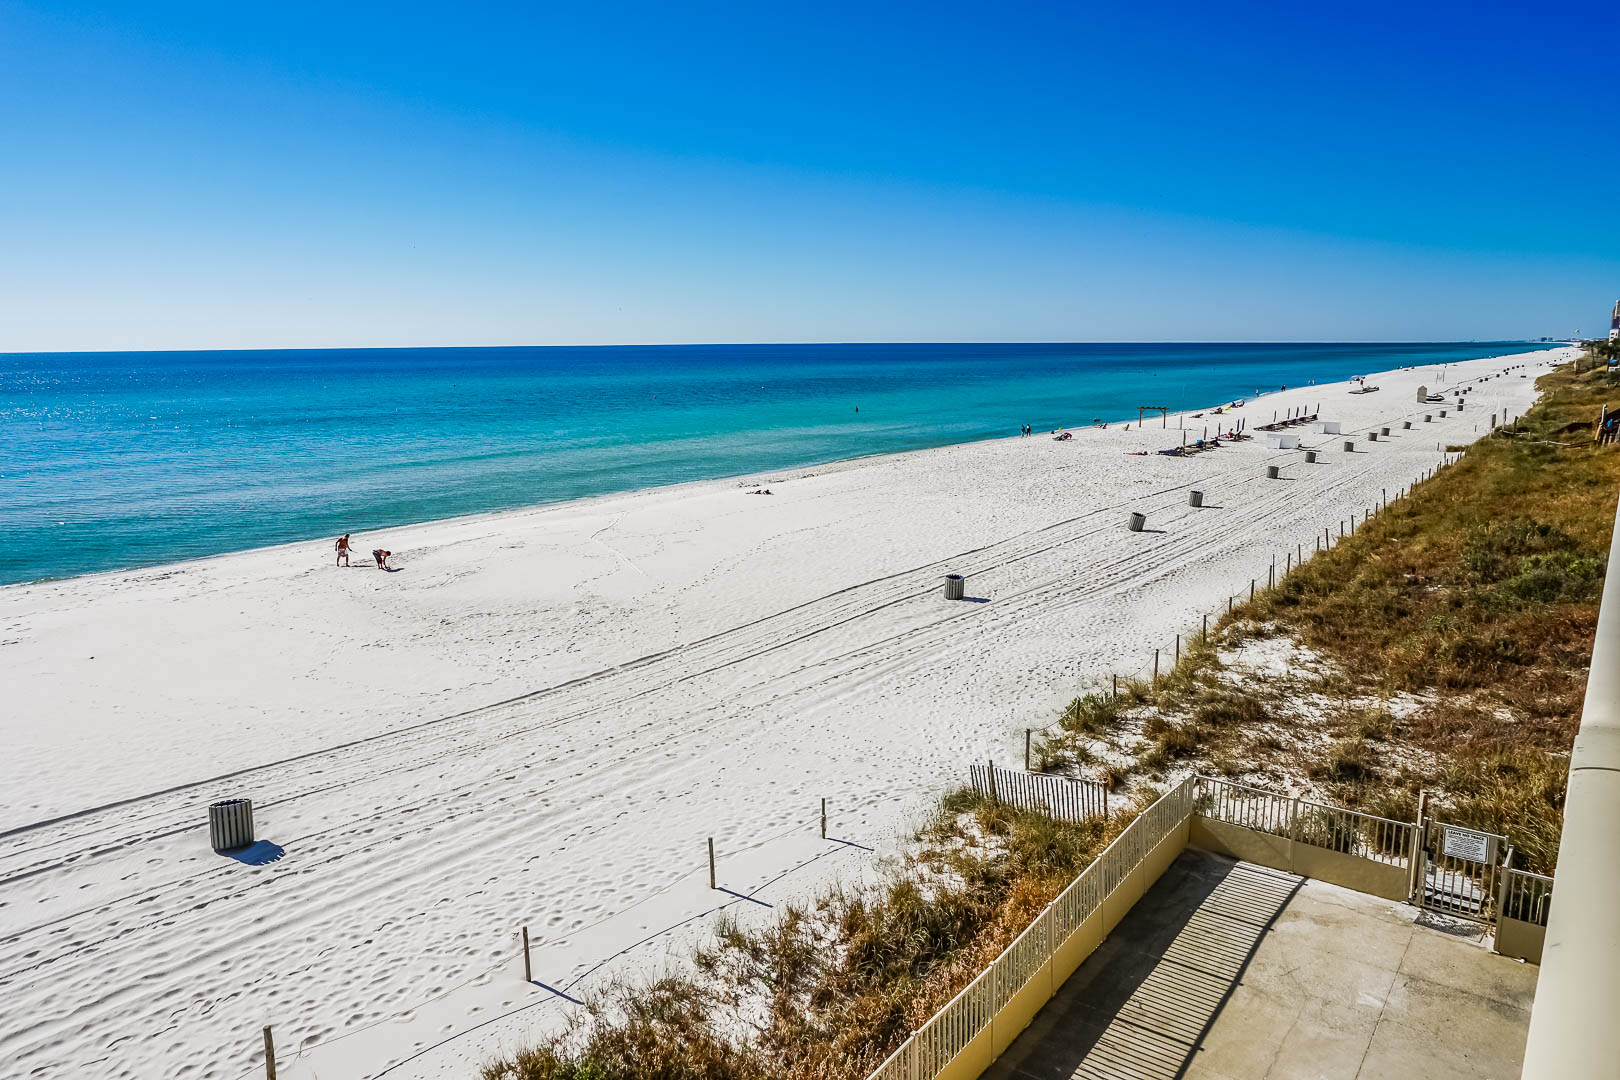 A relaxing ocean view from VRI's Panama City Resort & Club in Florida.